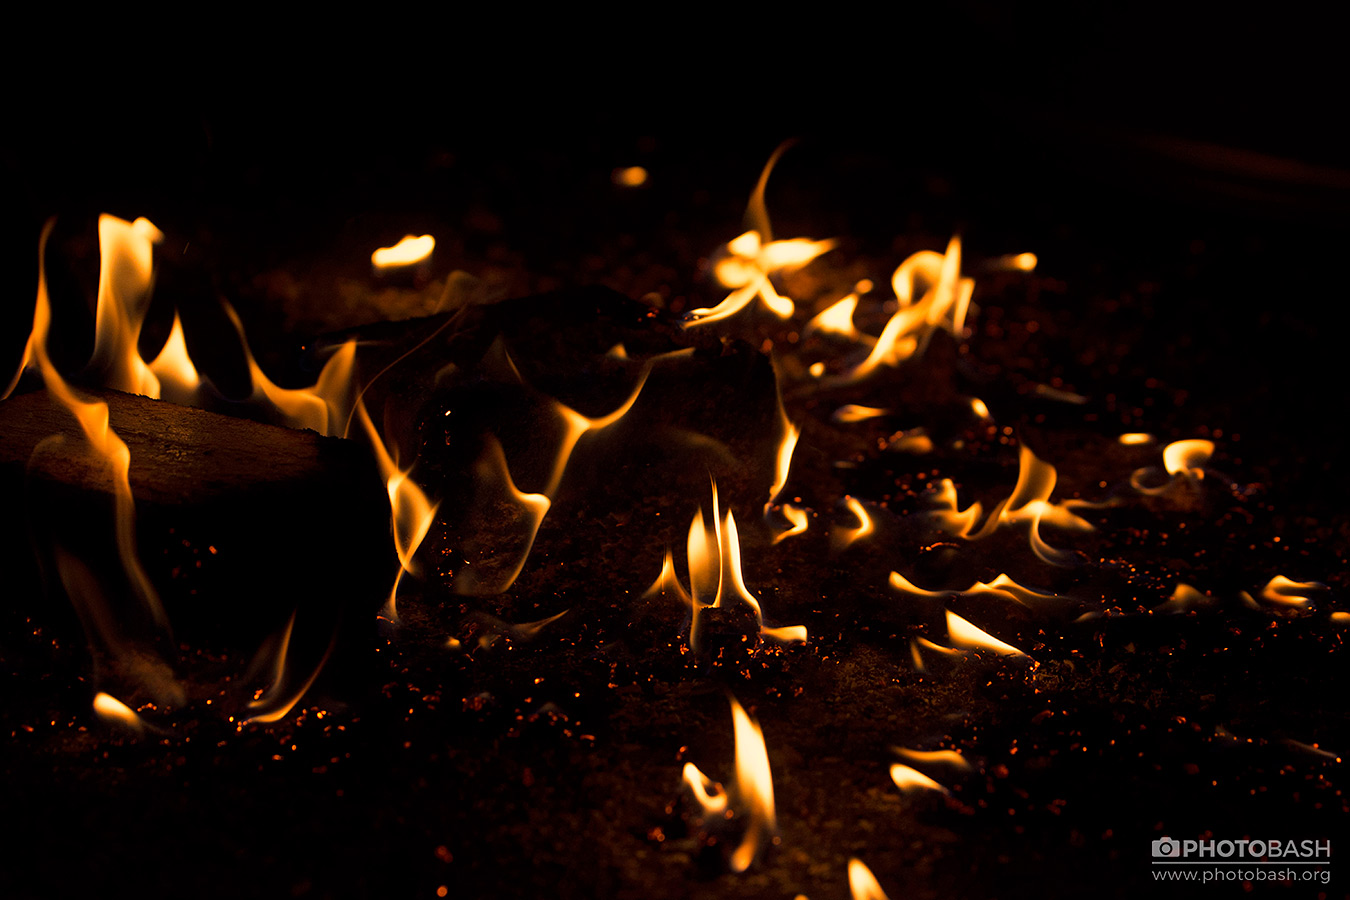 Fire-Flames-Burning-Embers.jpg